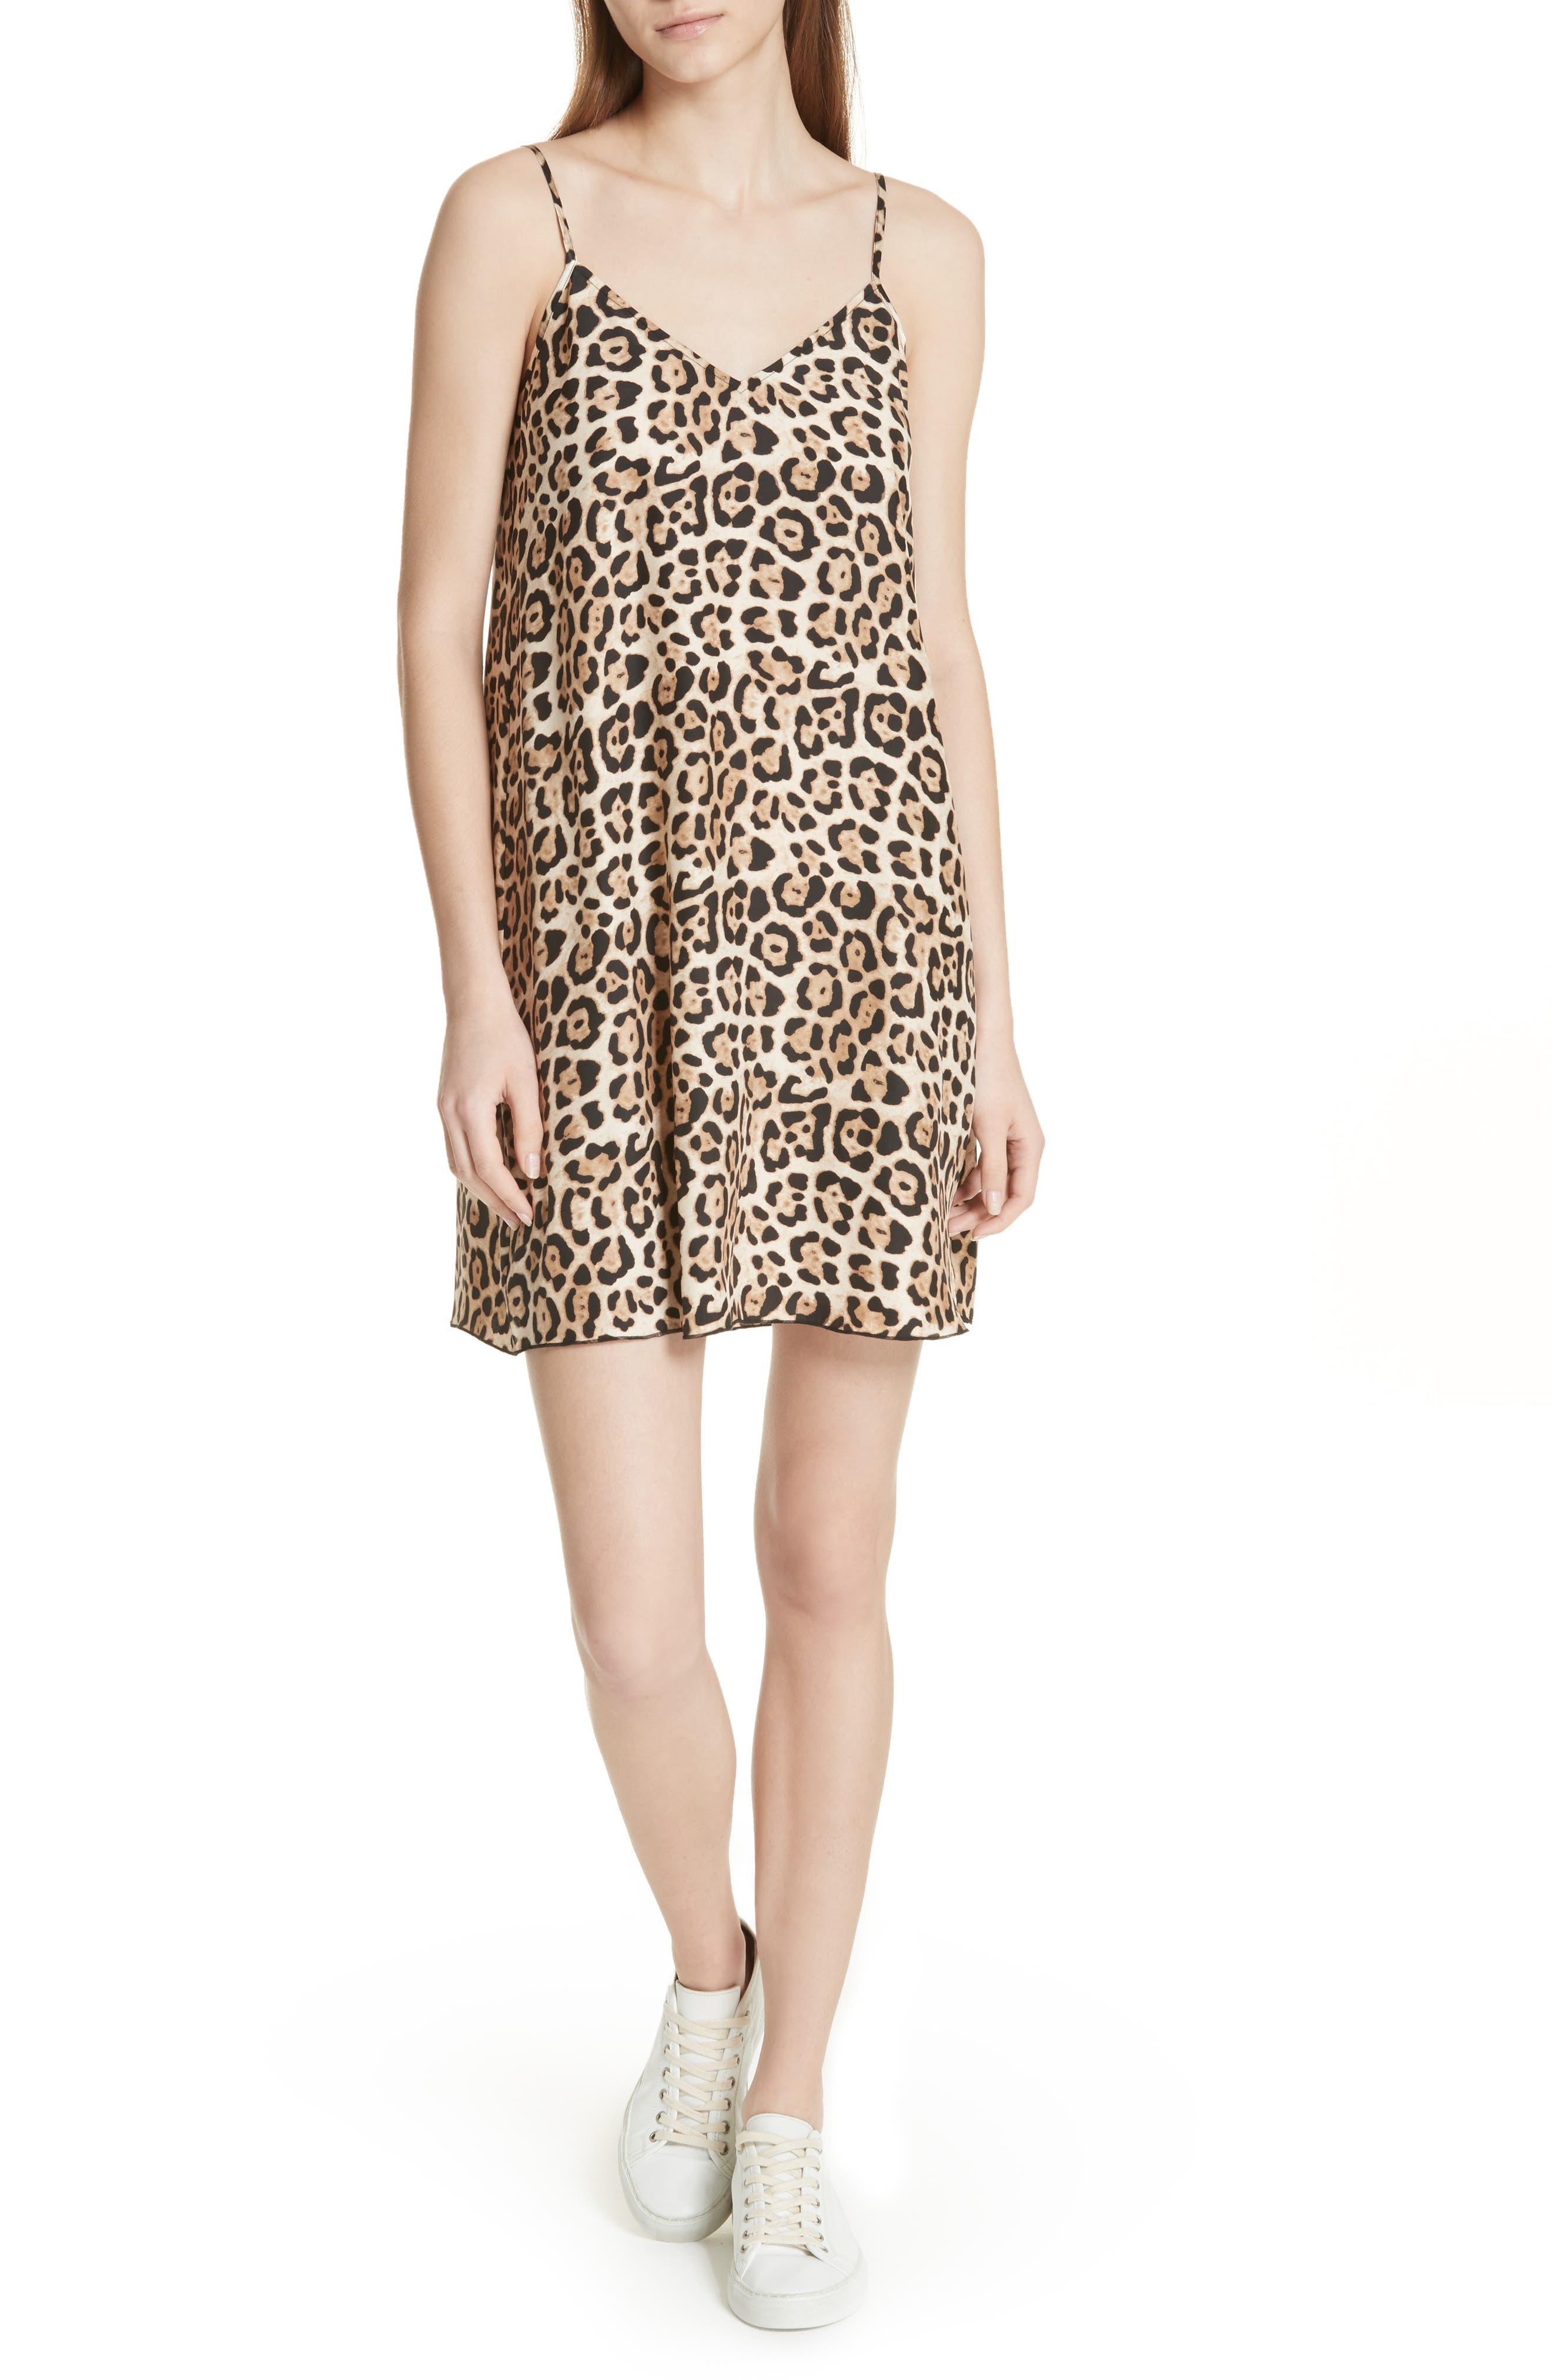 Atm Anthony Thomas Melillo Leopard Print Silk Slipdress, Brown